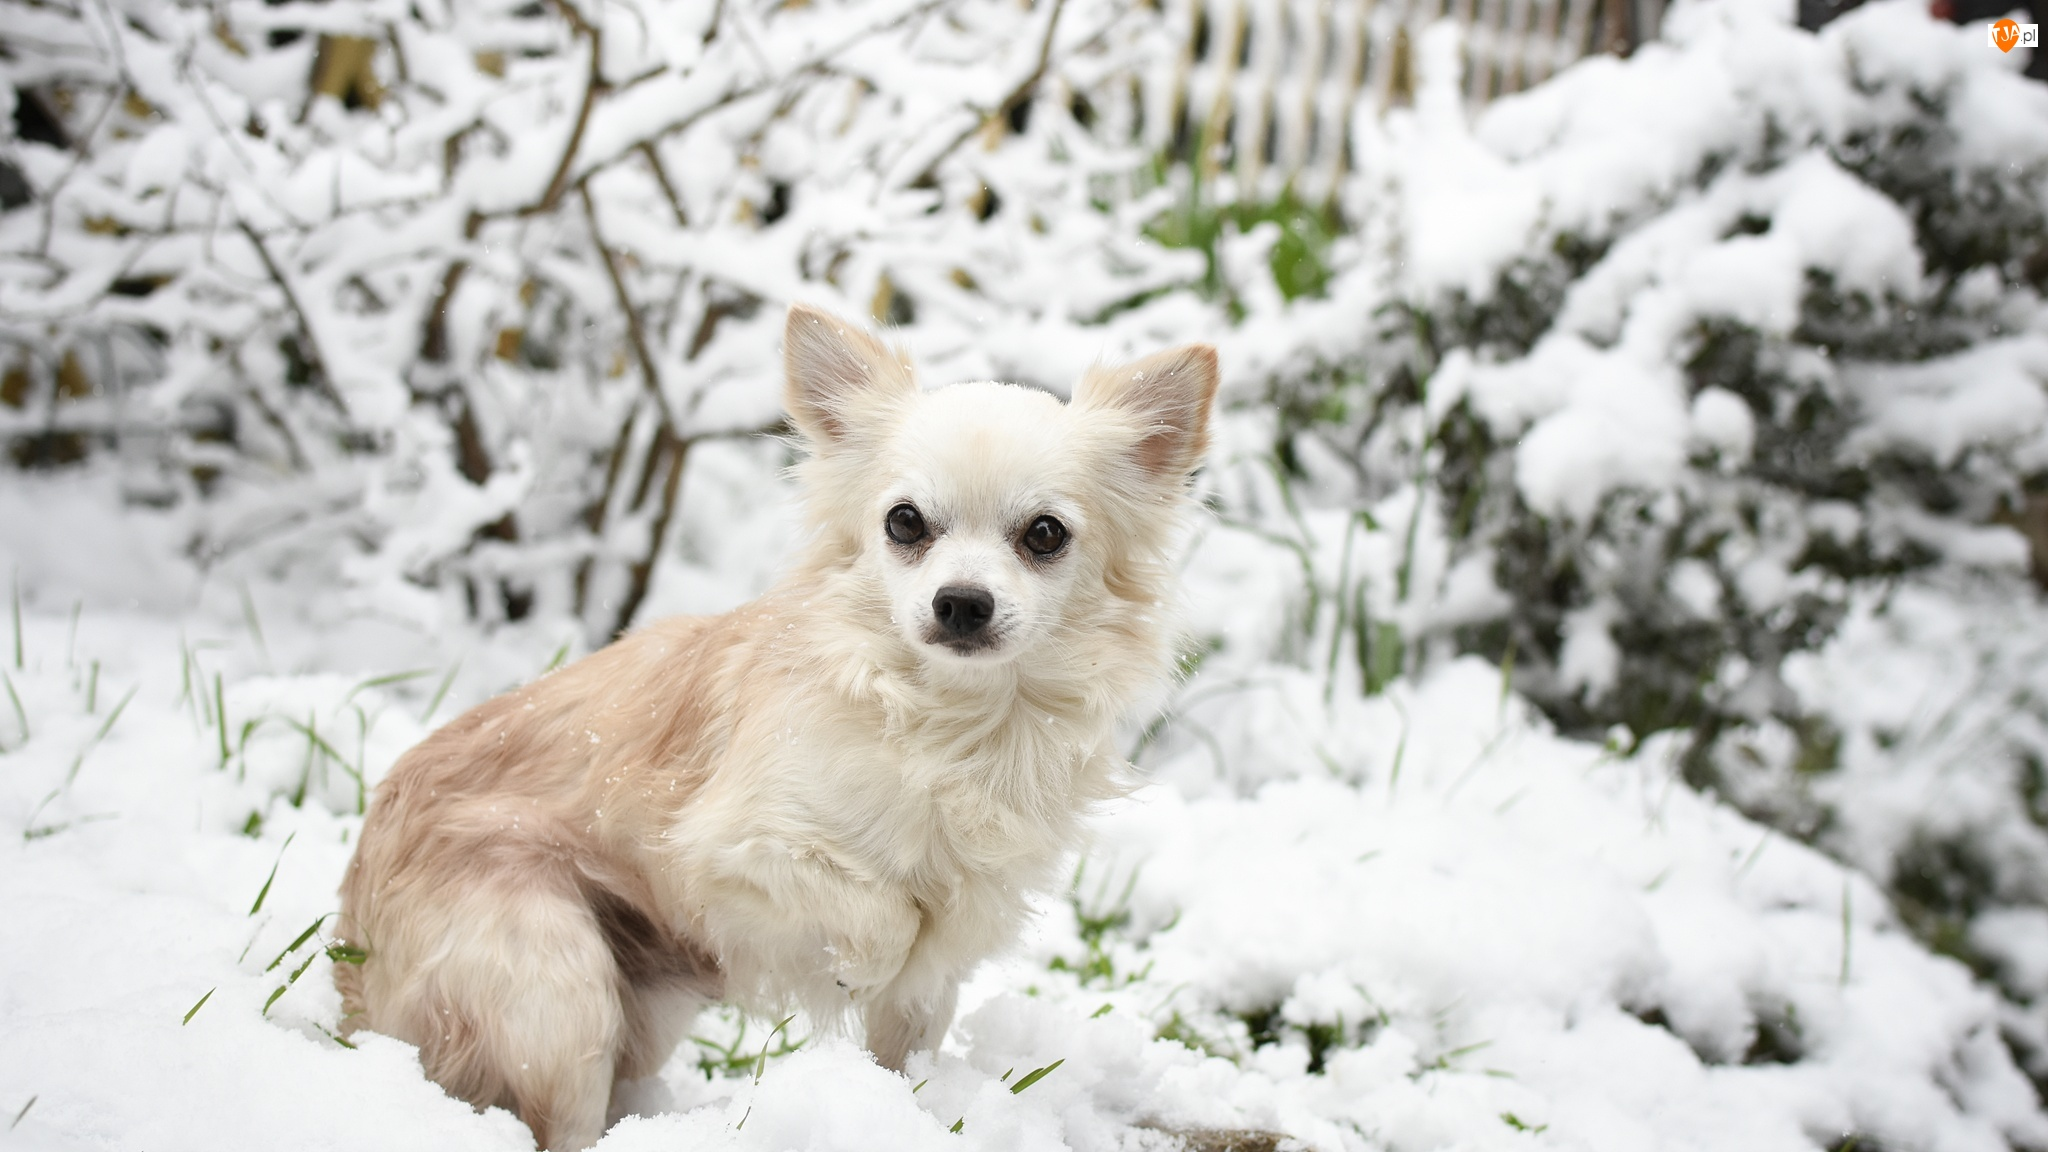 Śnieg, Pies, Chihuahua długowłosa